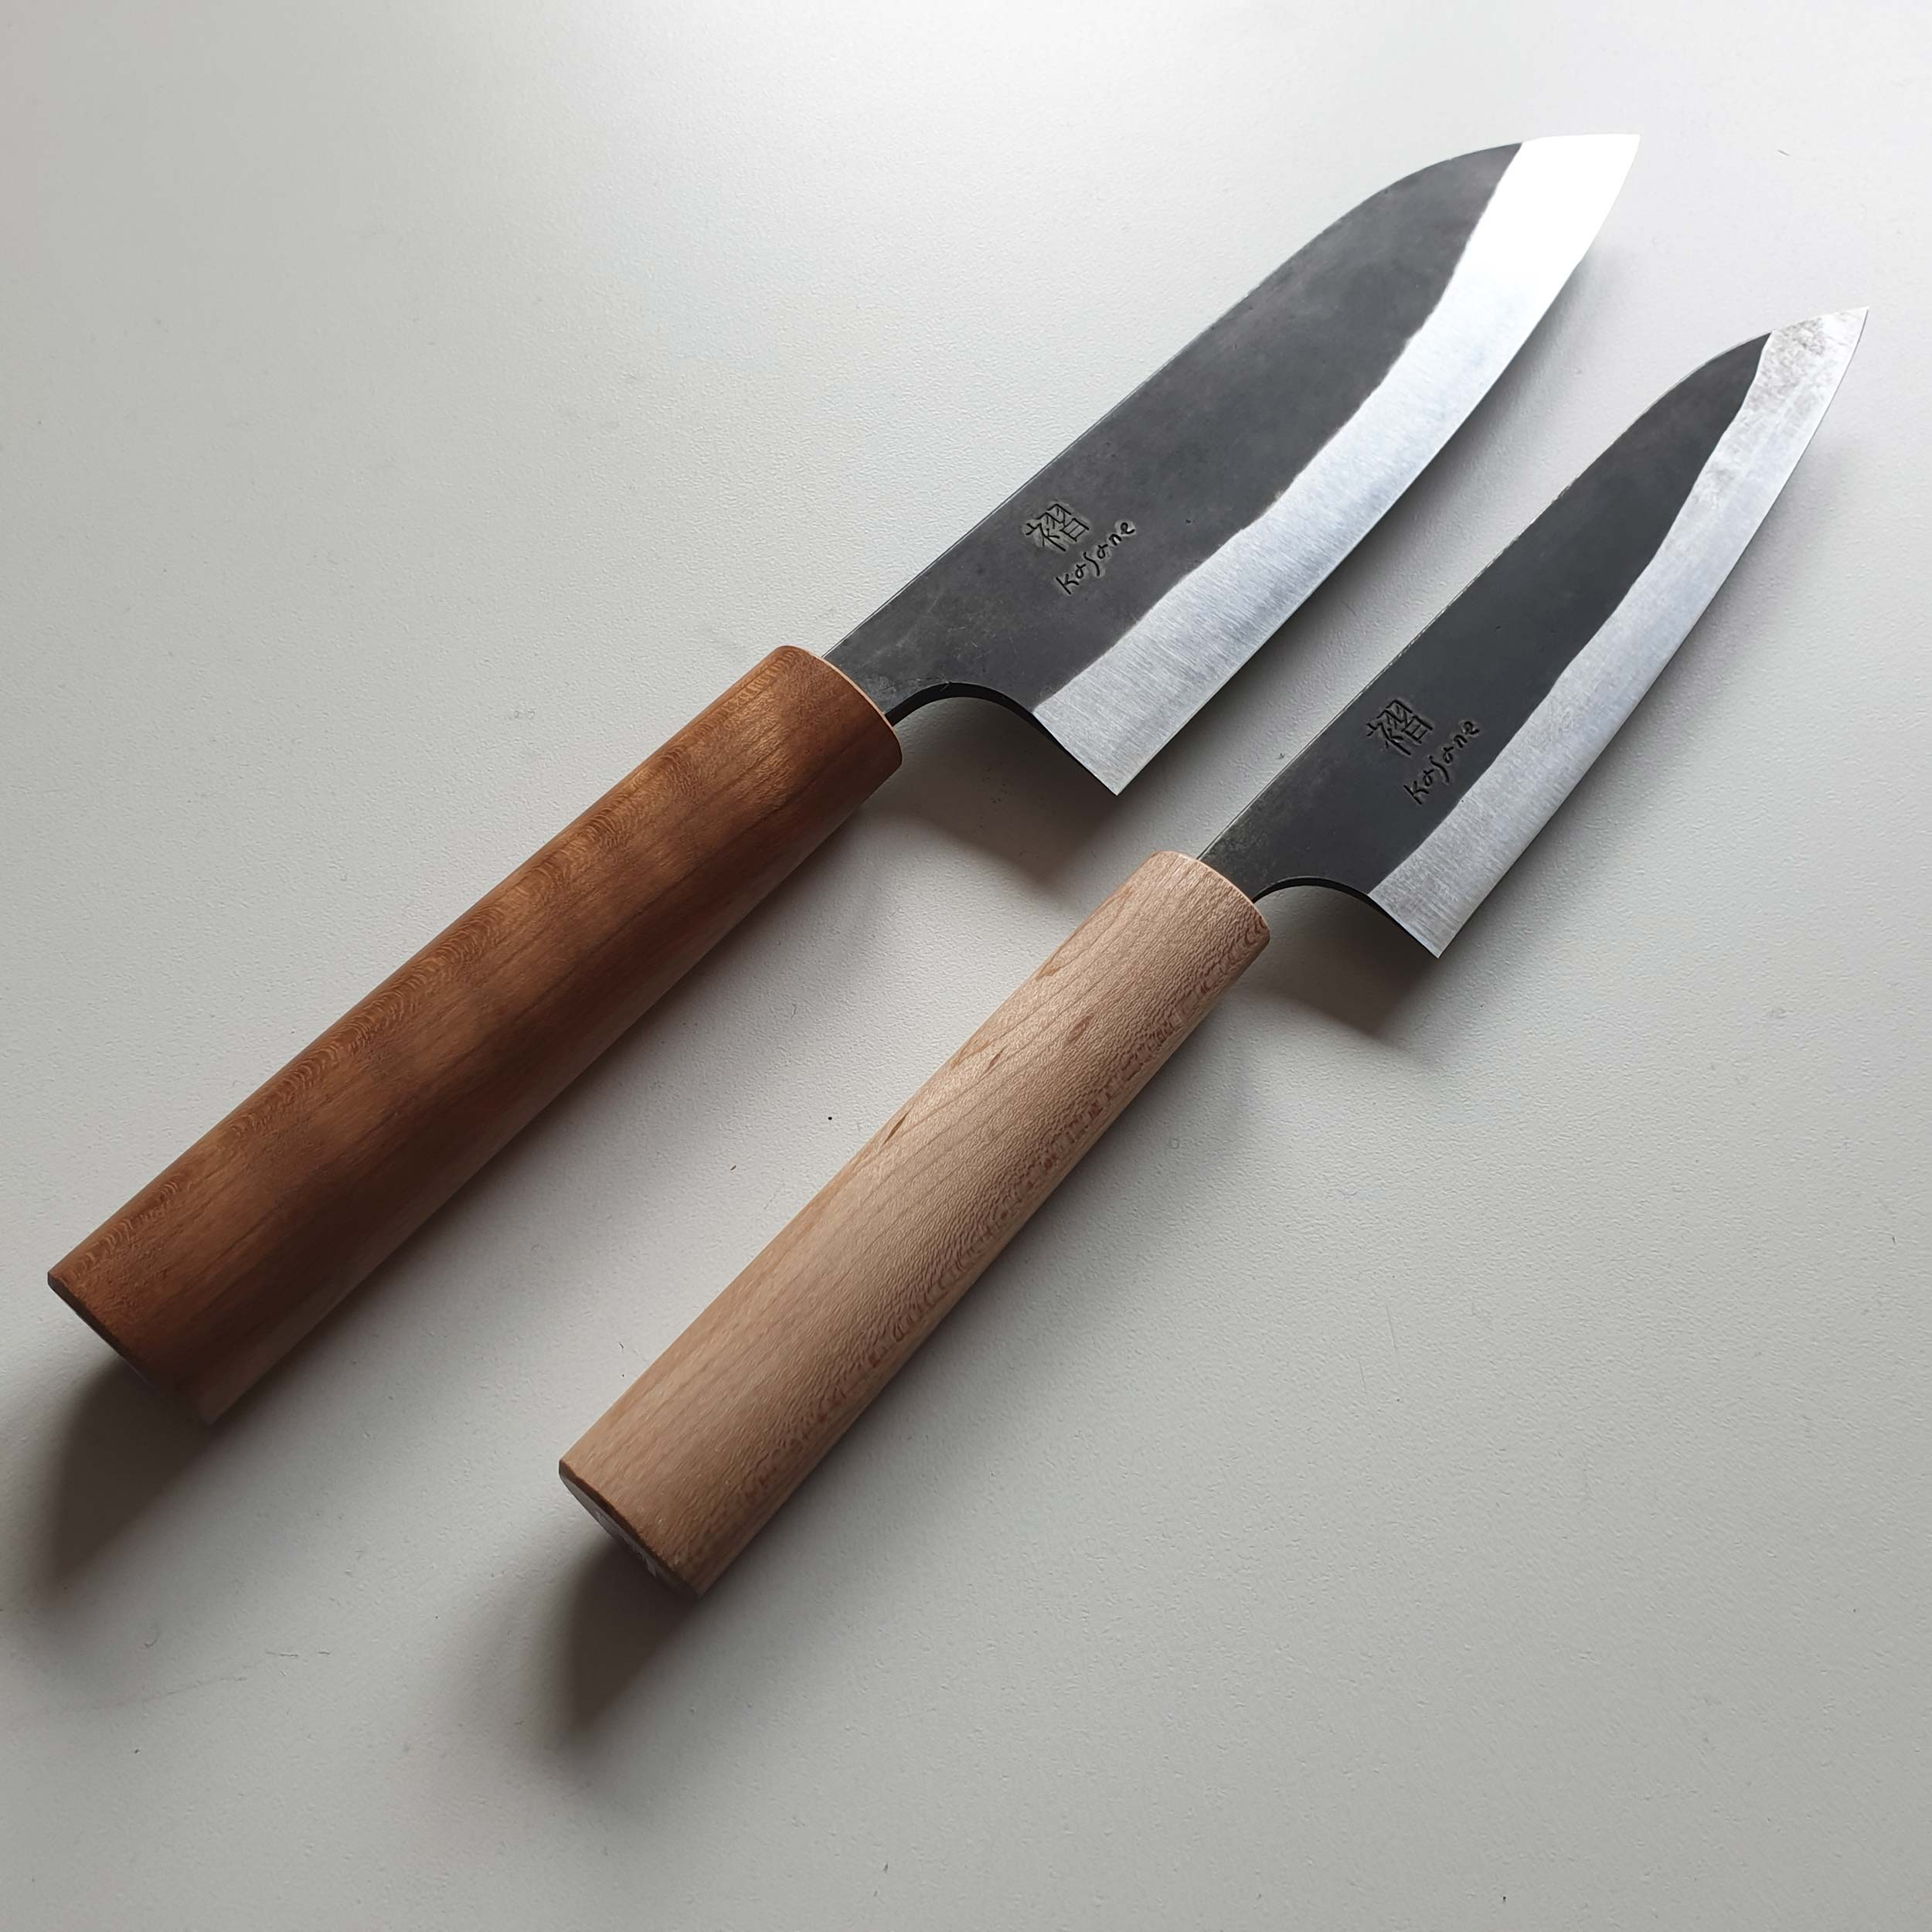 Katsushige Anryu Kasane knives